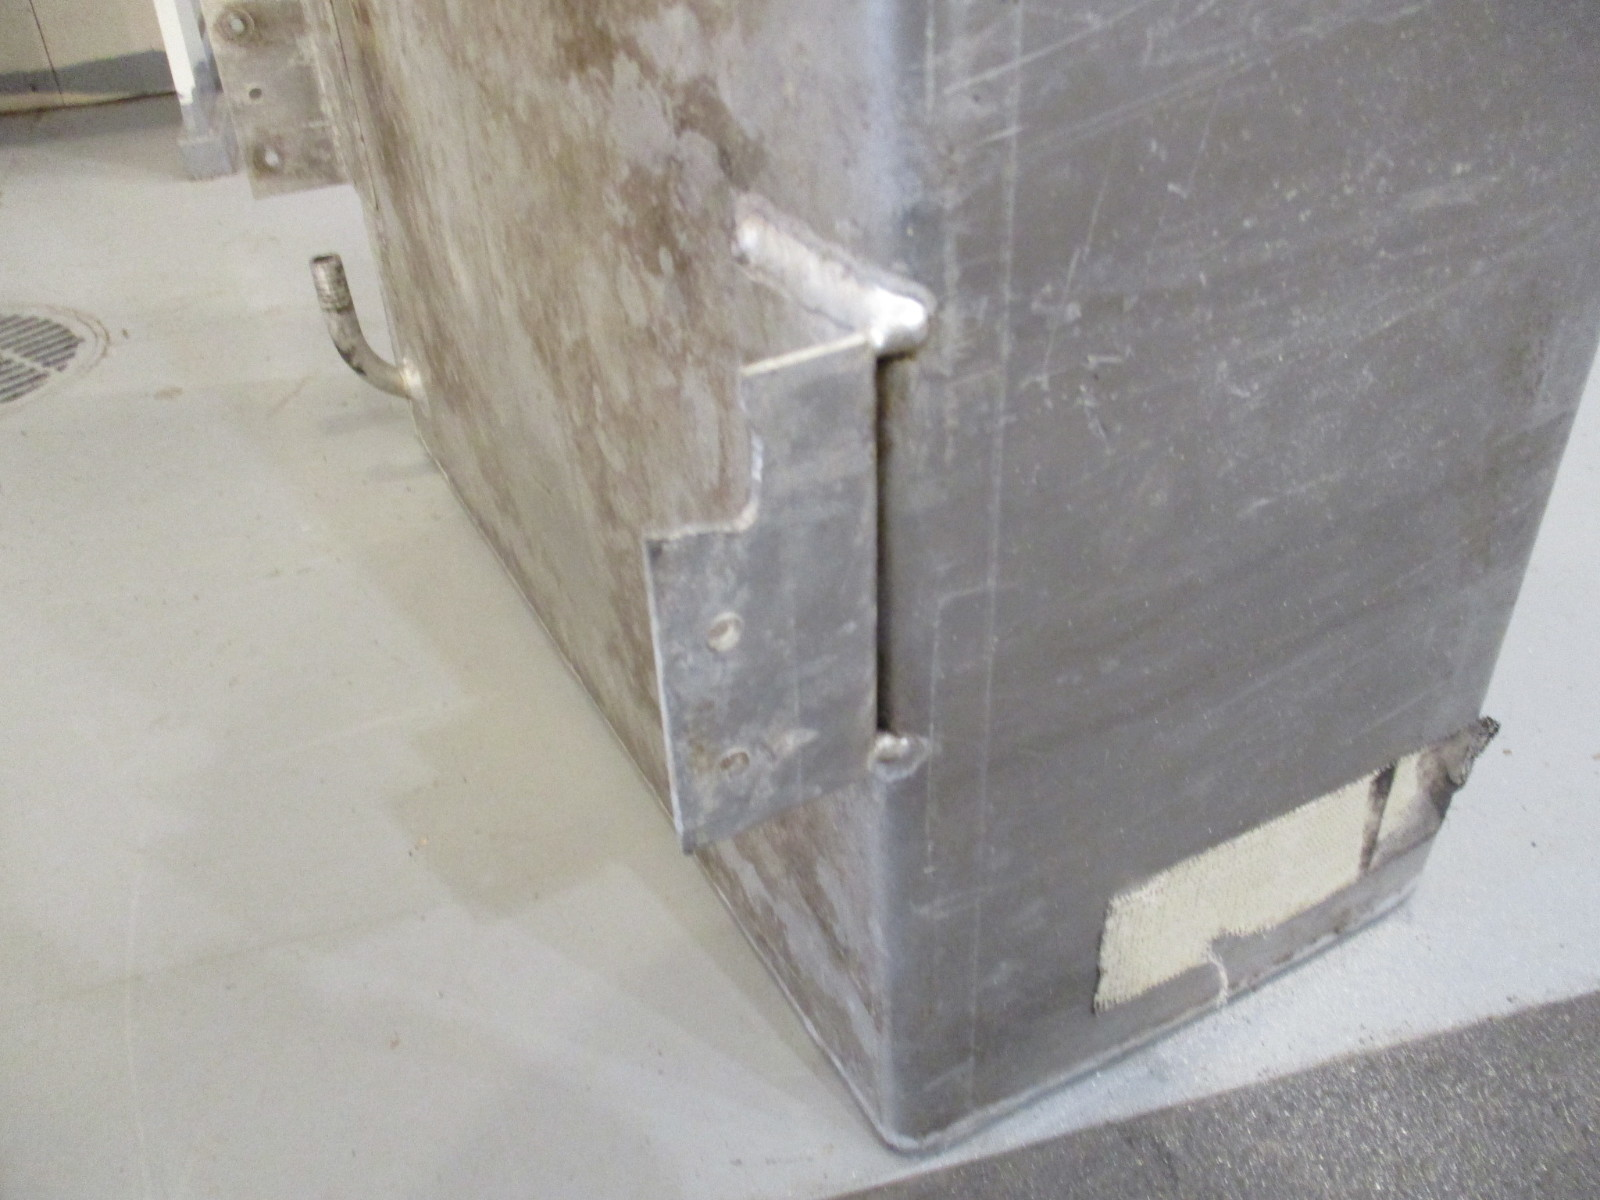 Aluminum Marine Boat Gas Tank Fuel Cell 44 Gallon 57 X 21 X 8 5 Inches